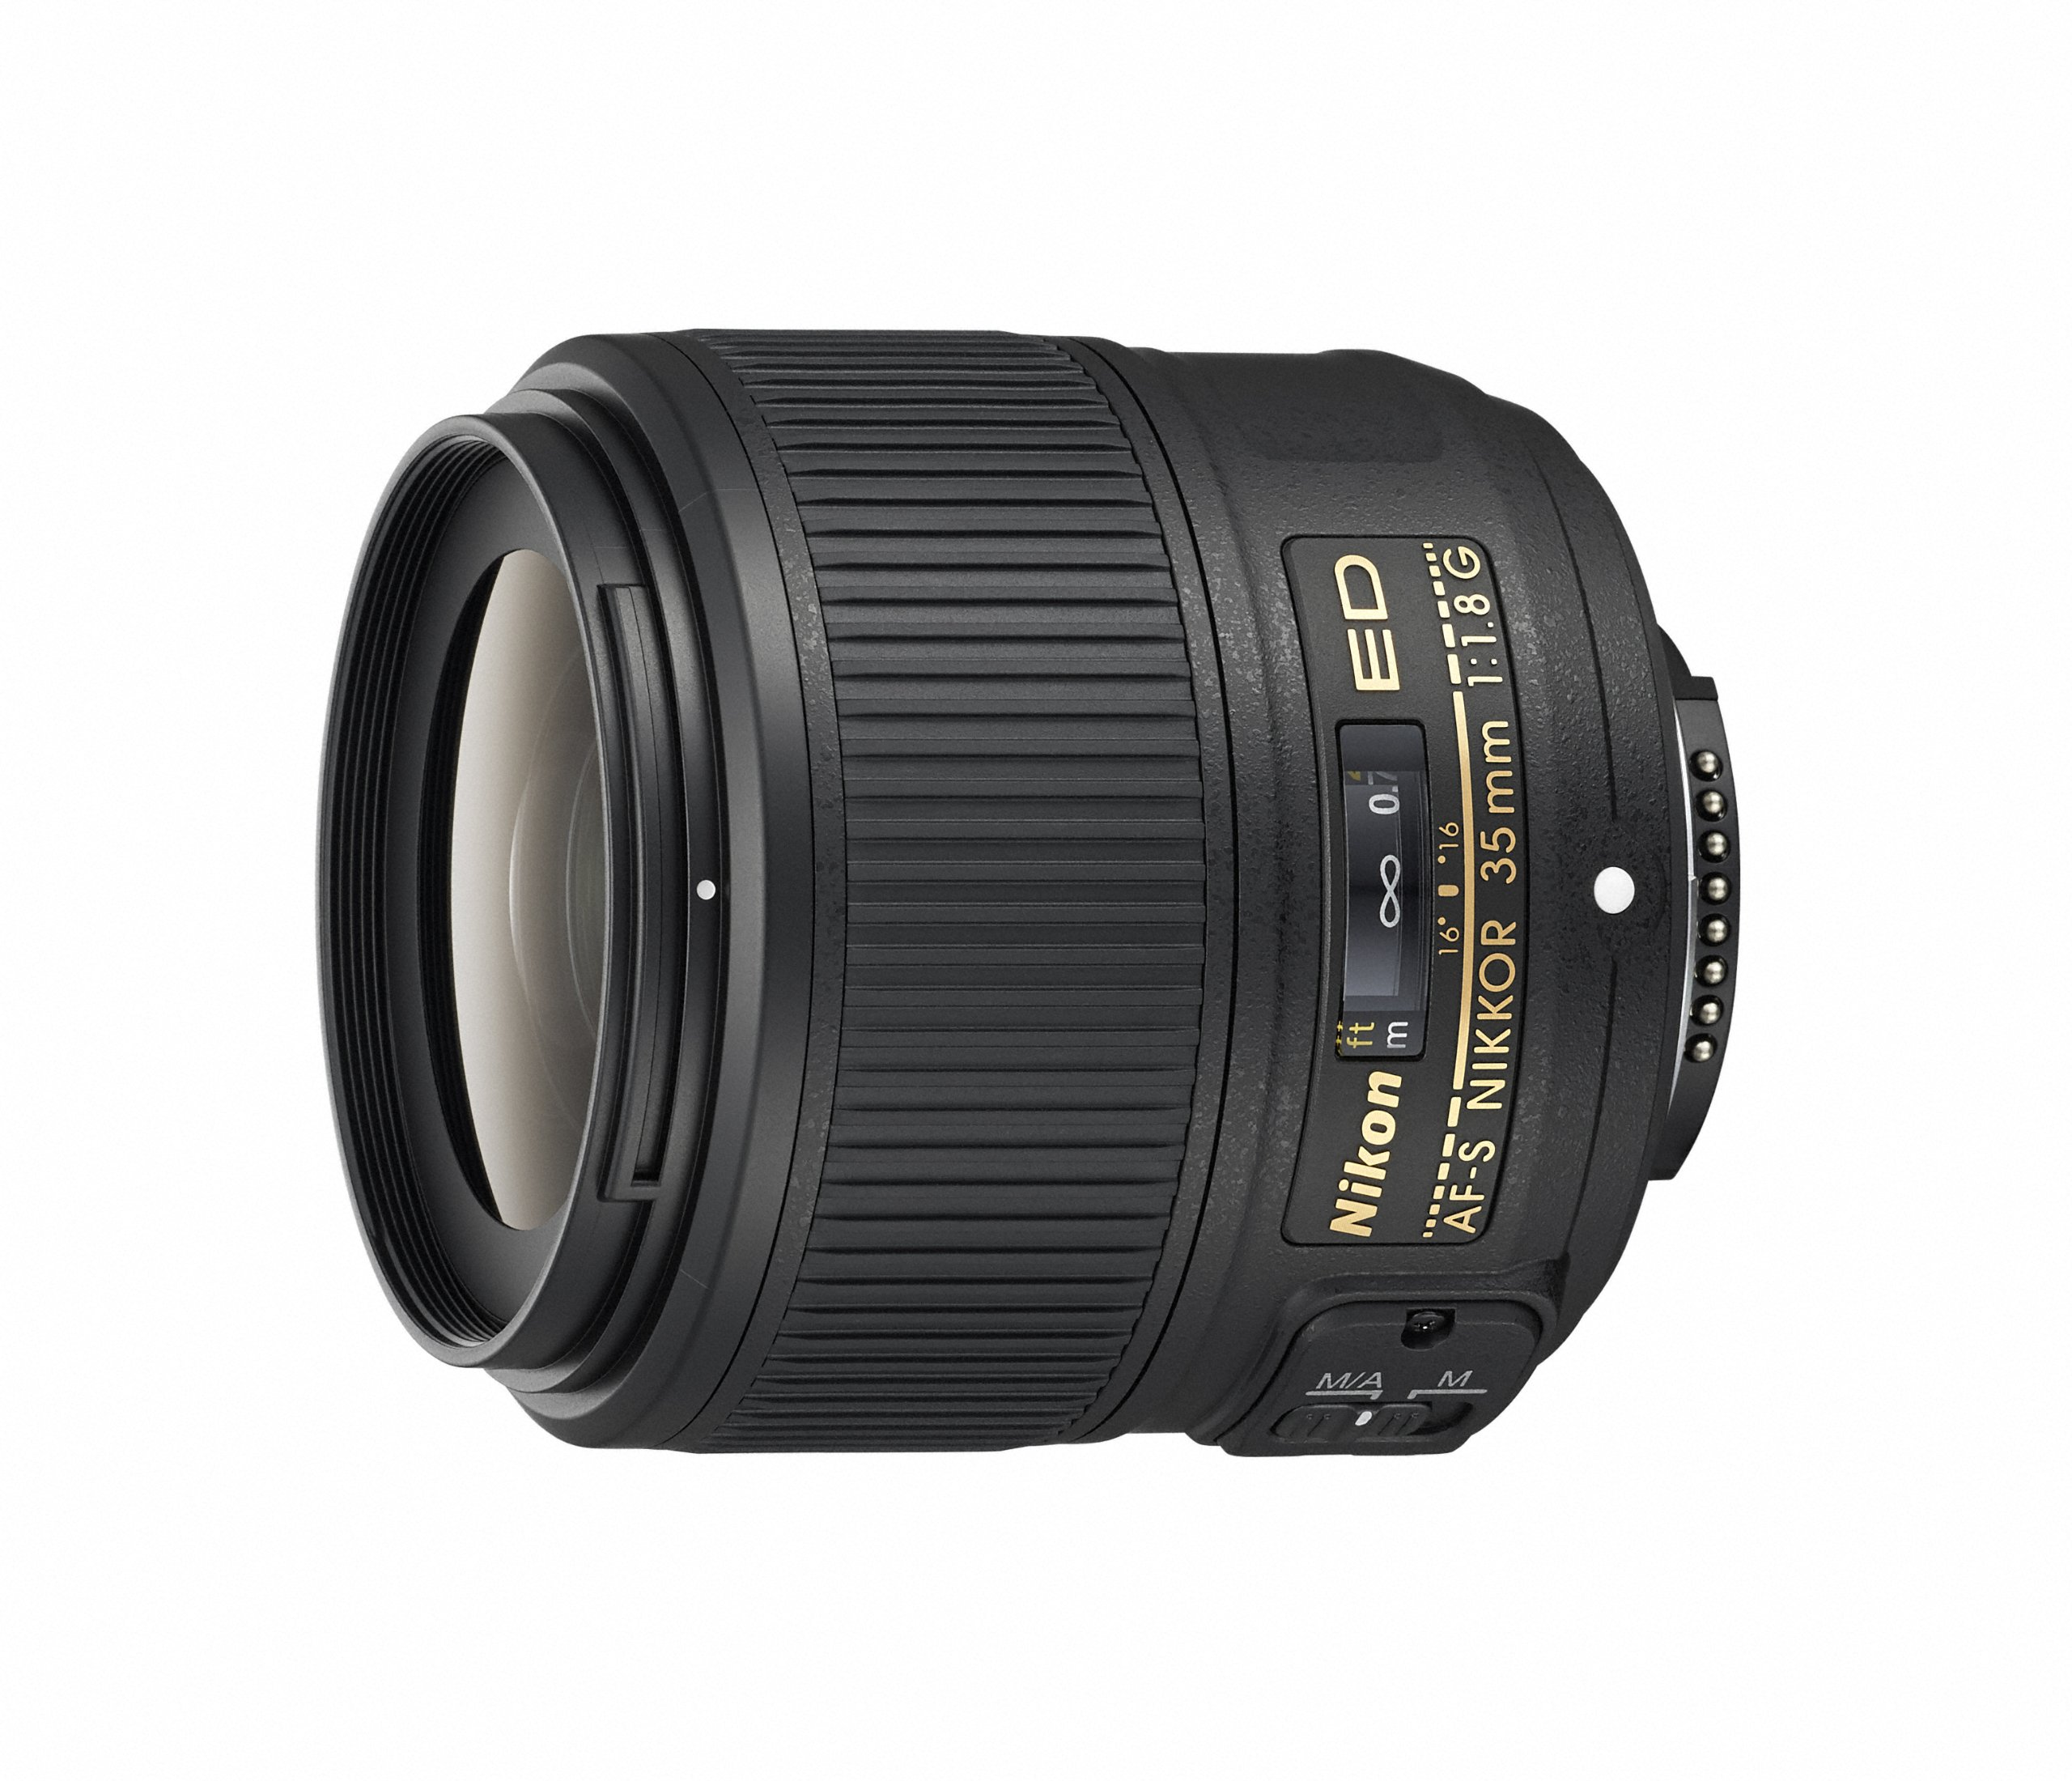 Nikon Obiettivo 35mm f/1,8 G AF-S ED